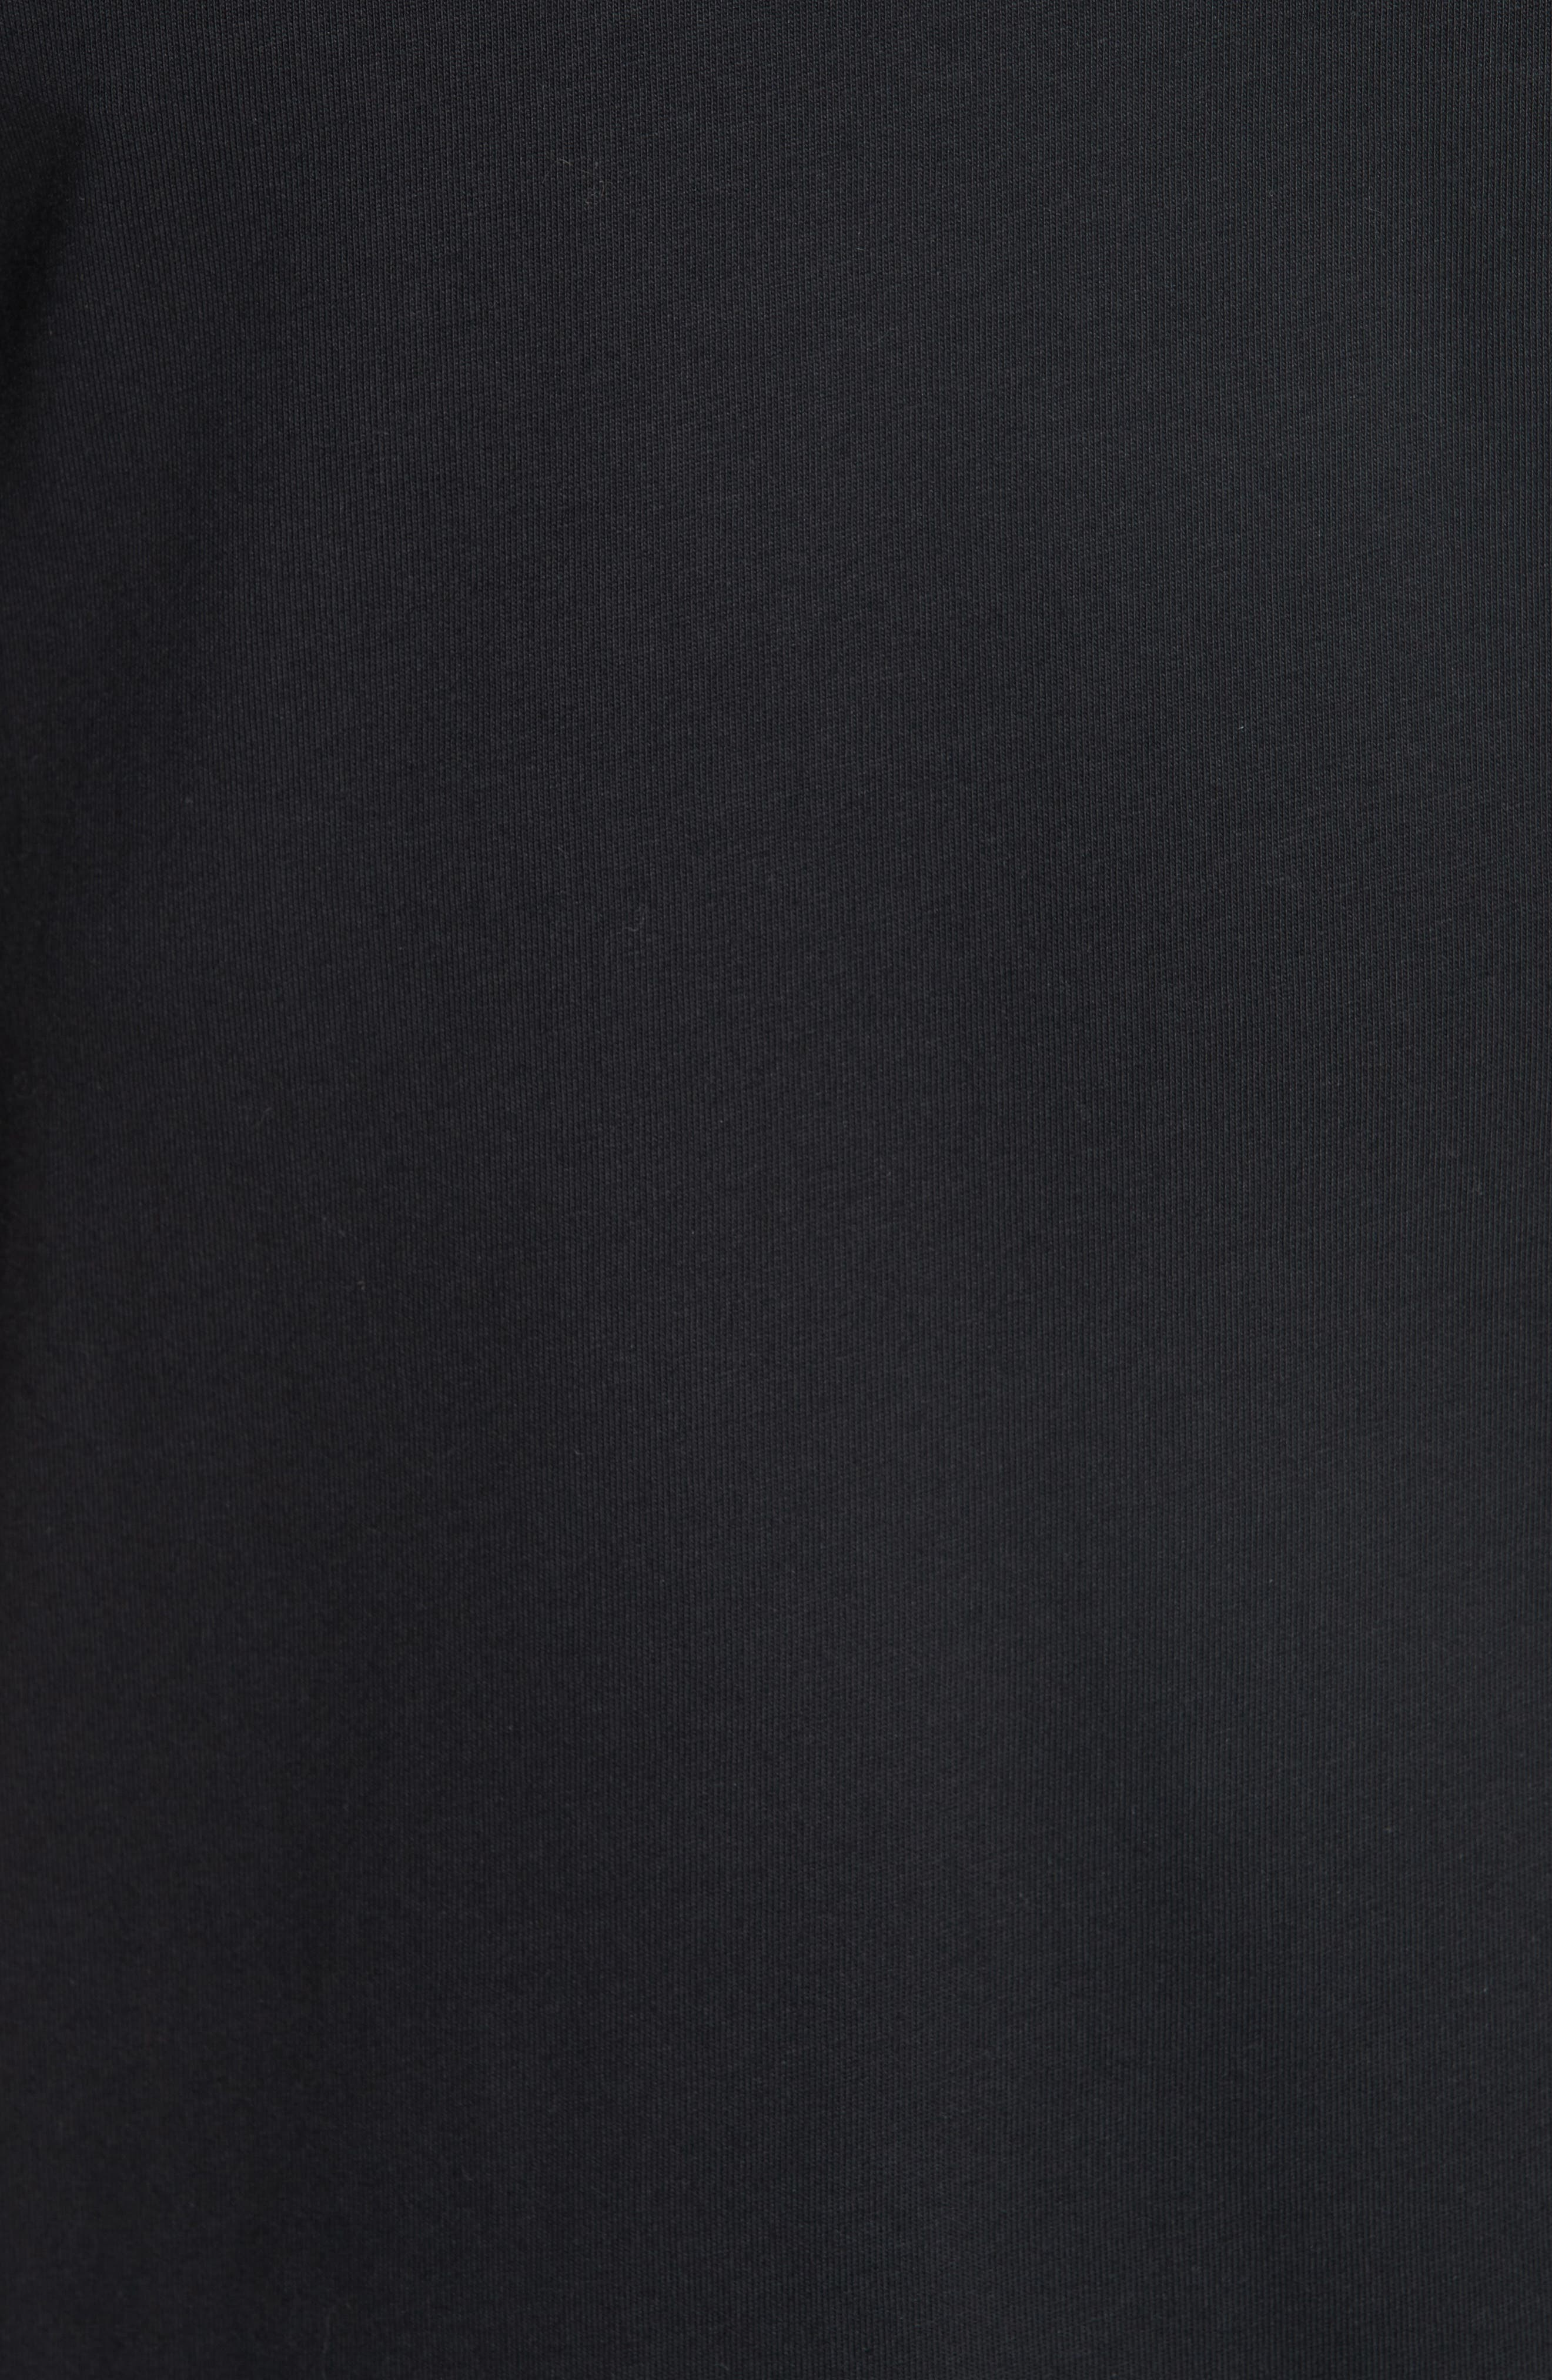 PPF Lamp Graphic T-Shirt,                             Alternate thumbnail 5, color,                             961